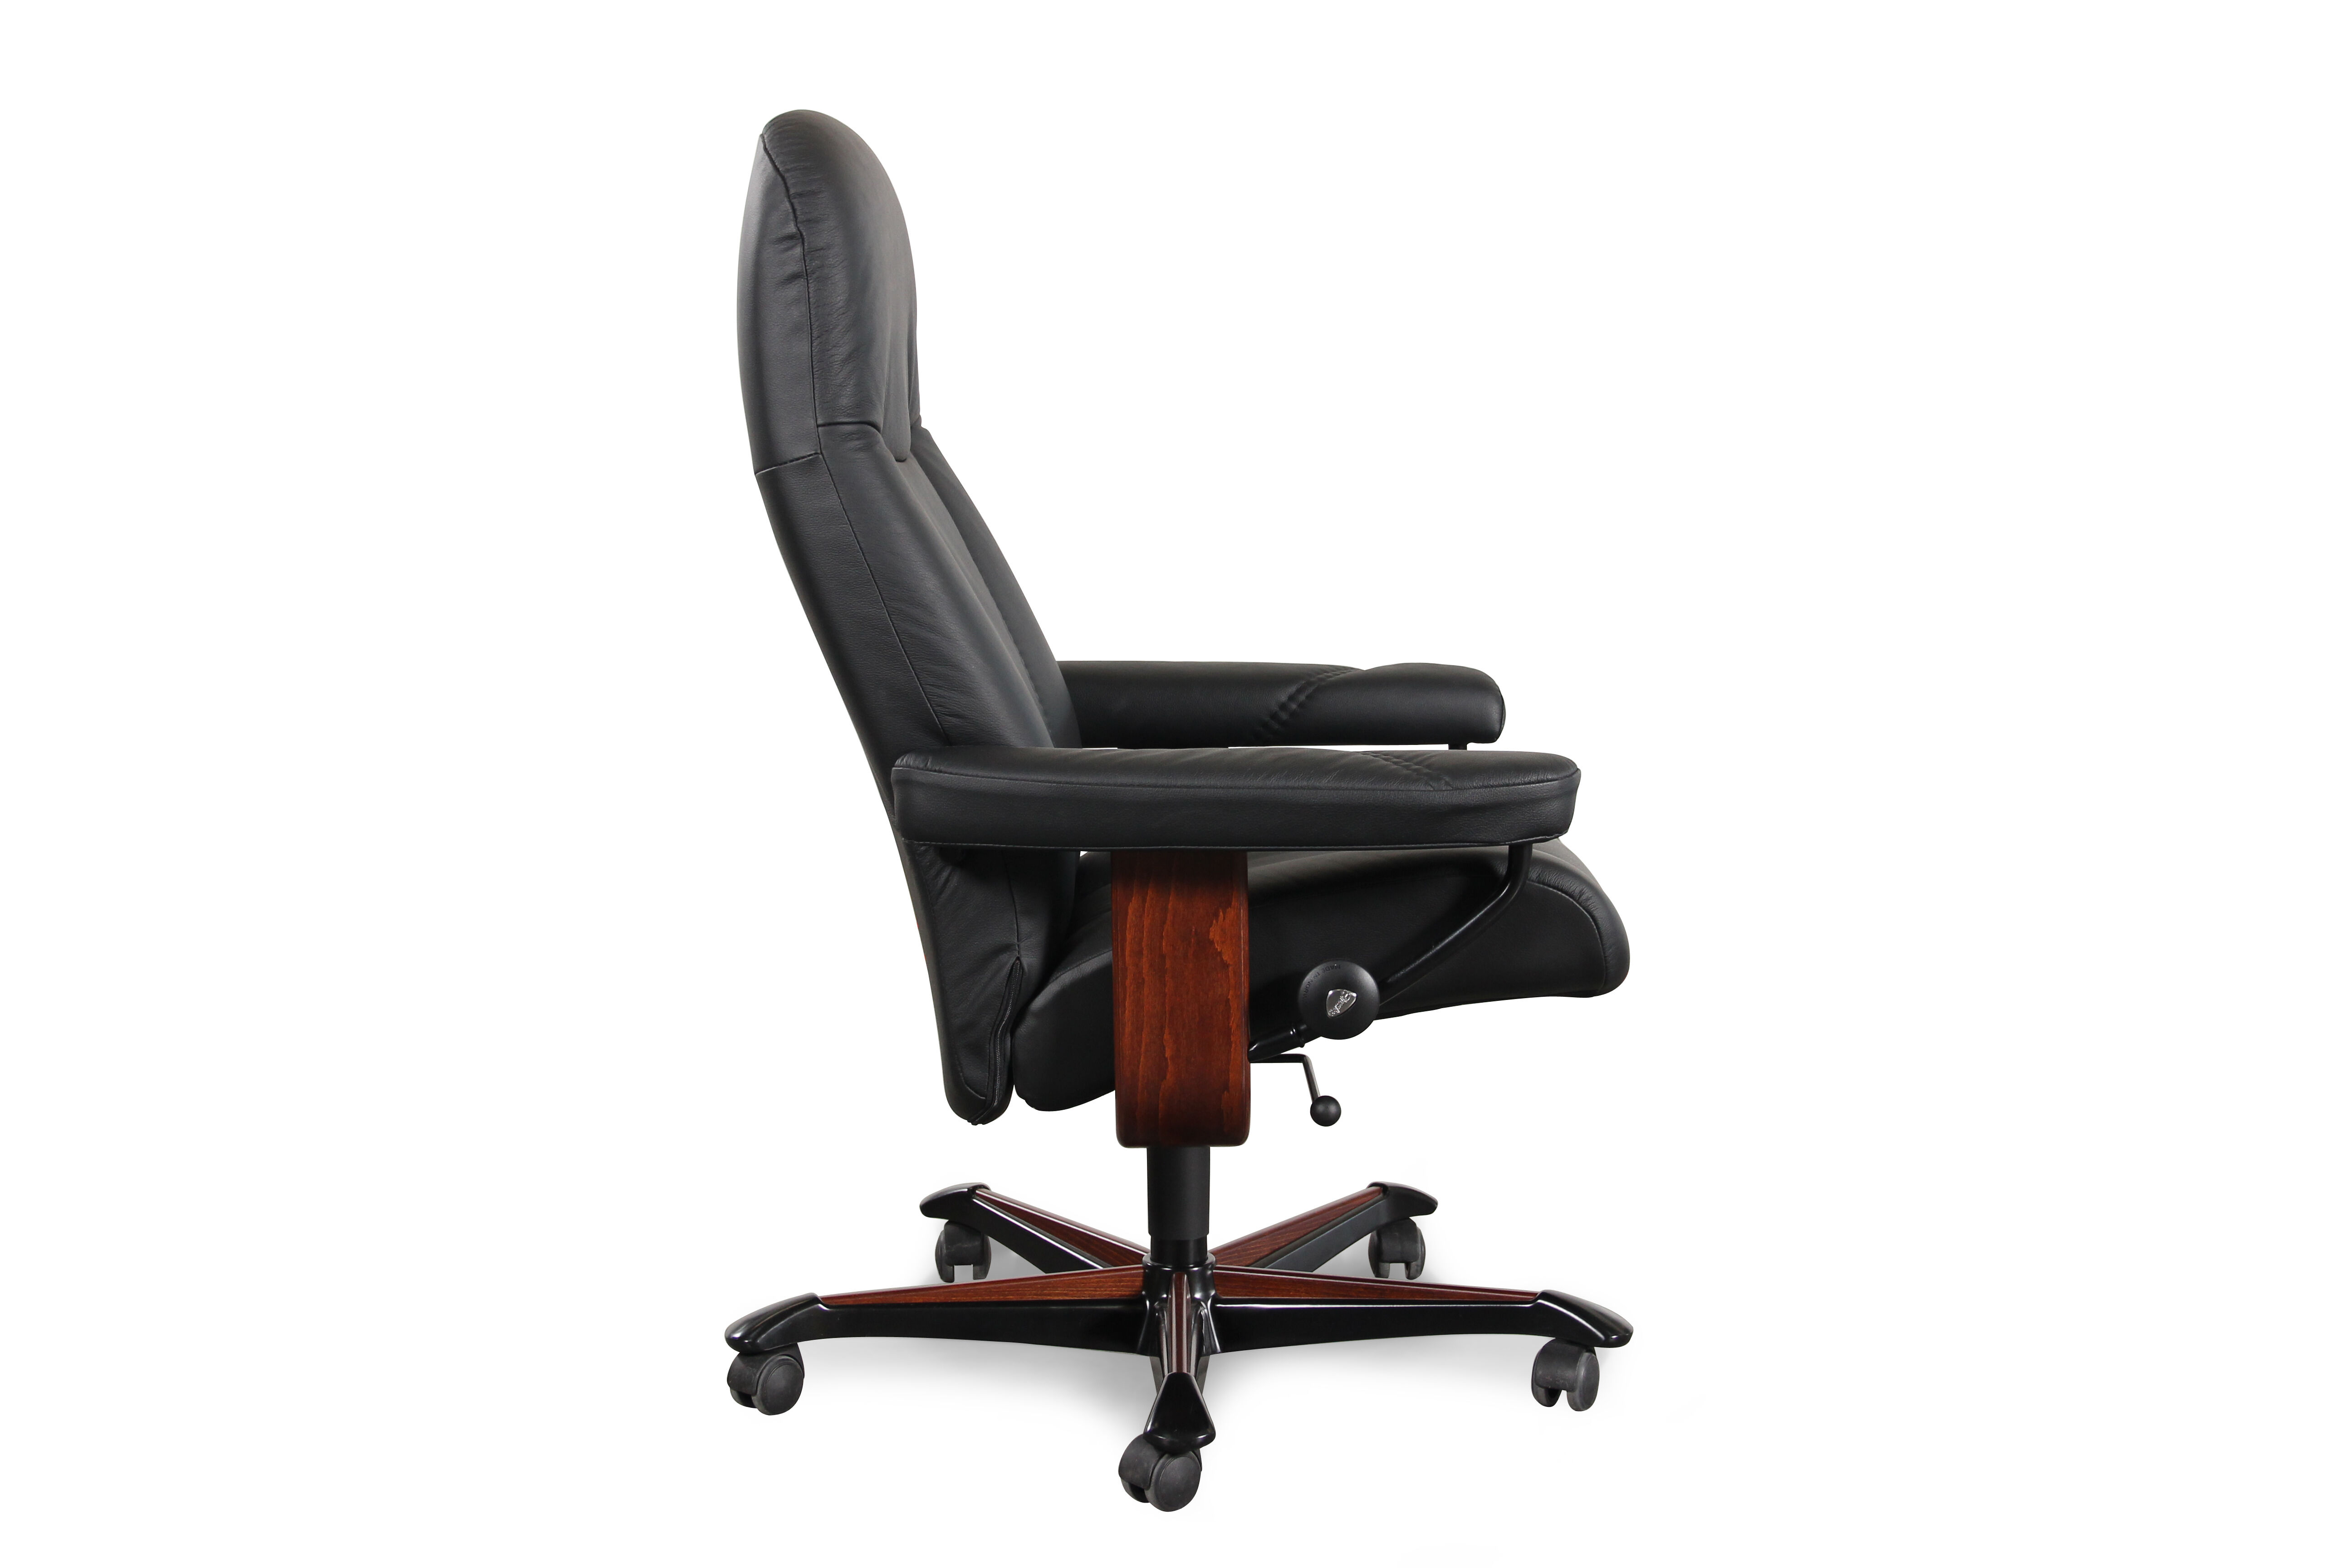 Stressless Consul ...  sc 1 st  Mathis Brothers & Stressless Consul Medium Batick Black Office Chair | Mathis ... islam-shia.org